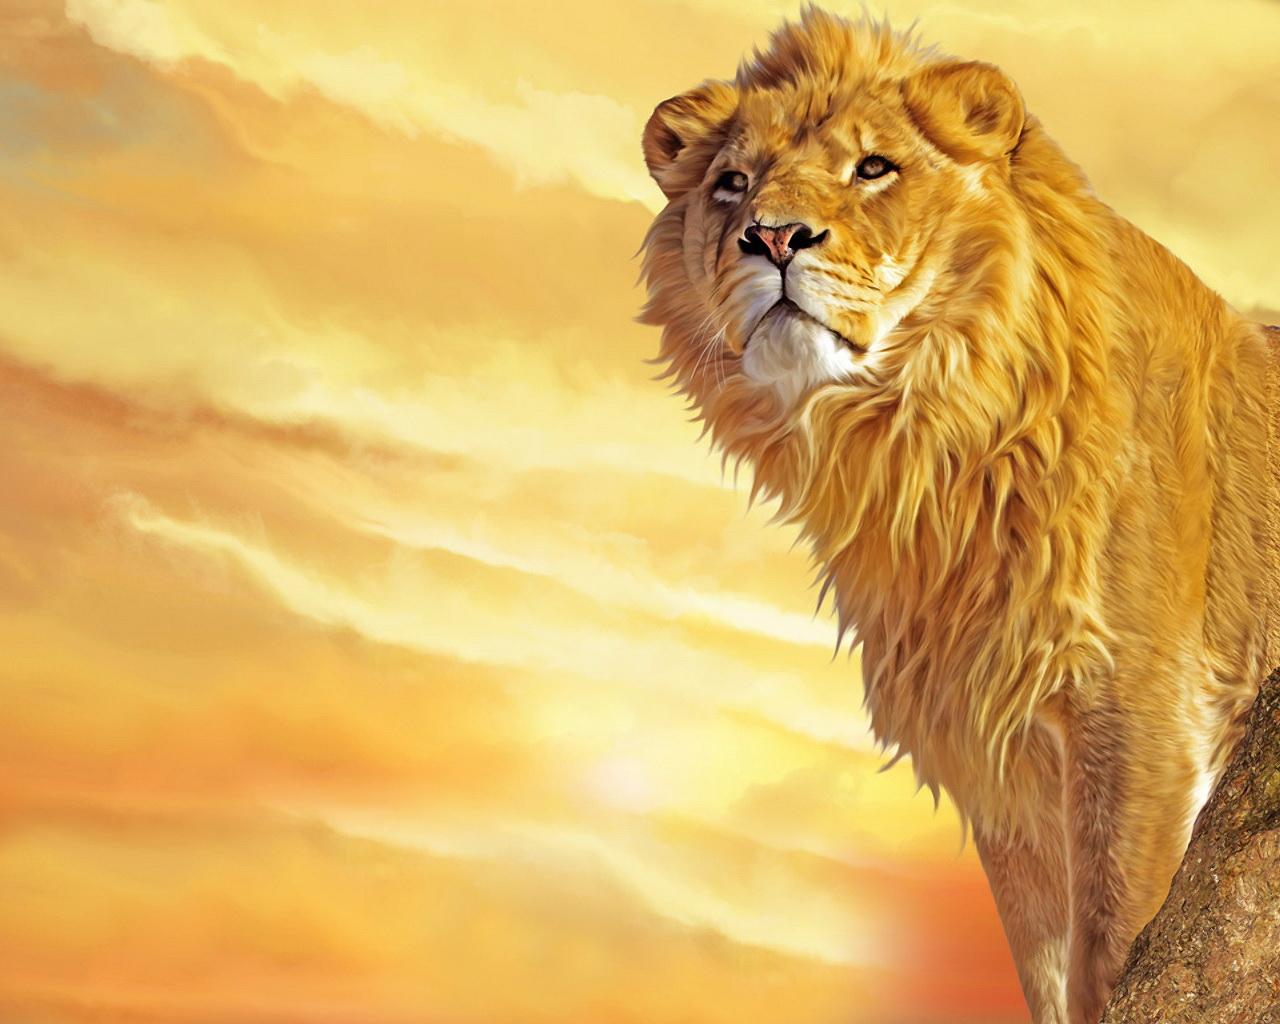 Free Download Wallpaper HD Lion Wallpapers HD